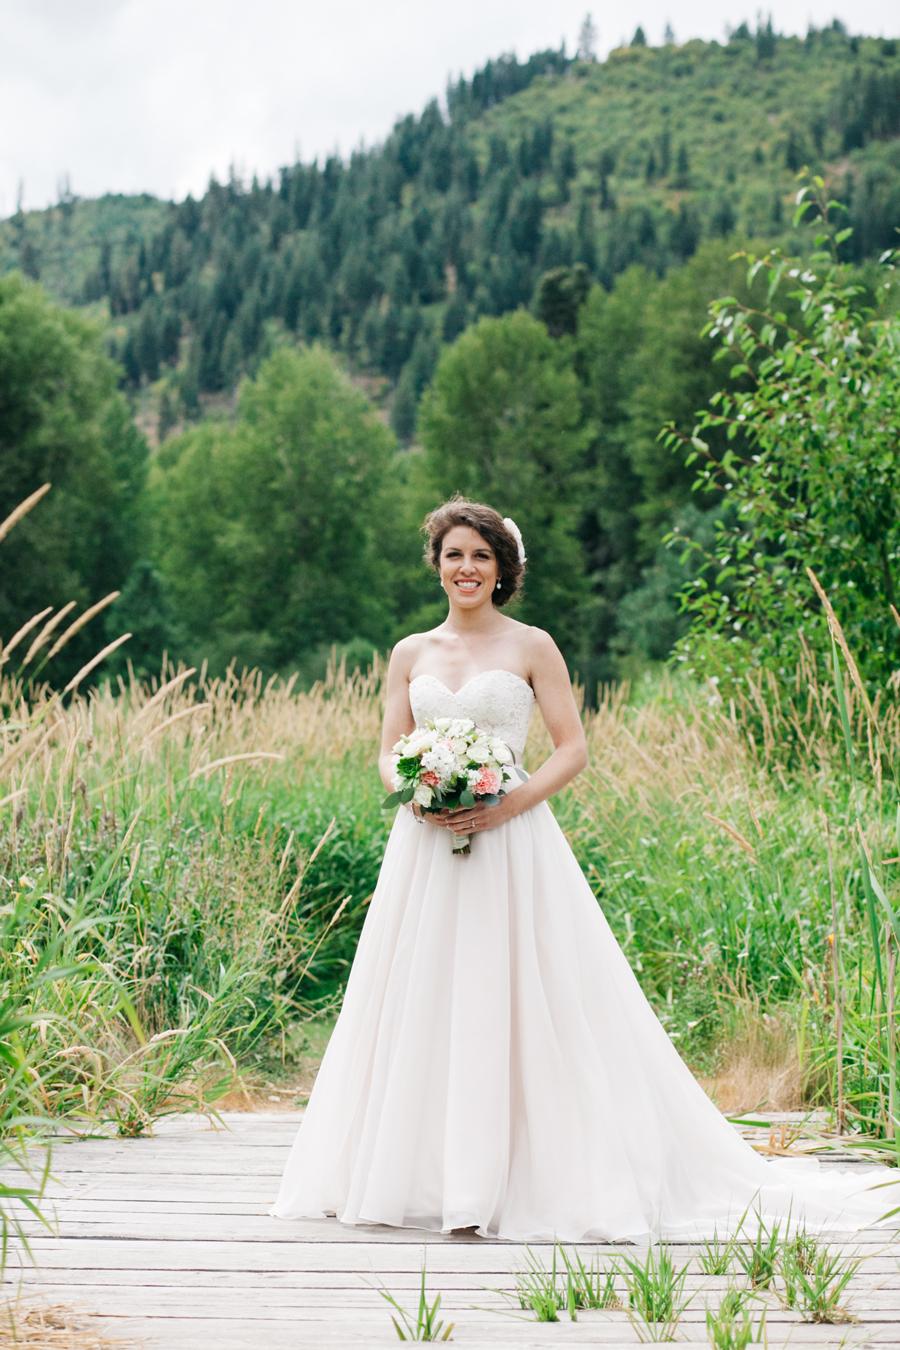 018-pine-river-ranch-leavenworth-washington-destination-wedding-katheryn-moran-photography.jpg